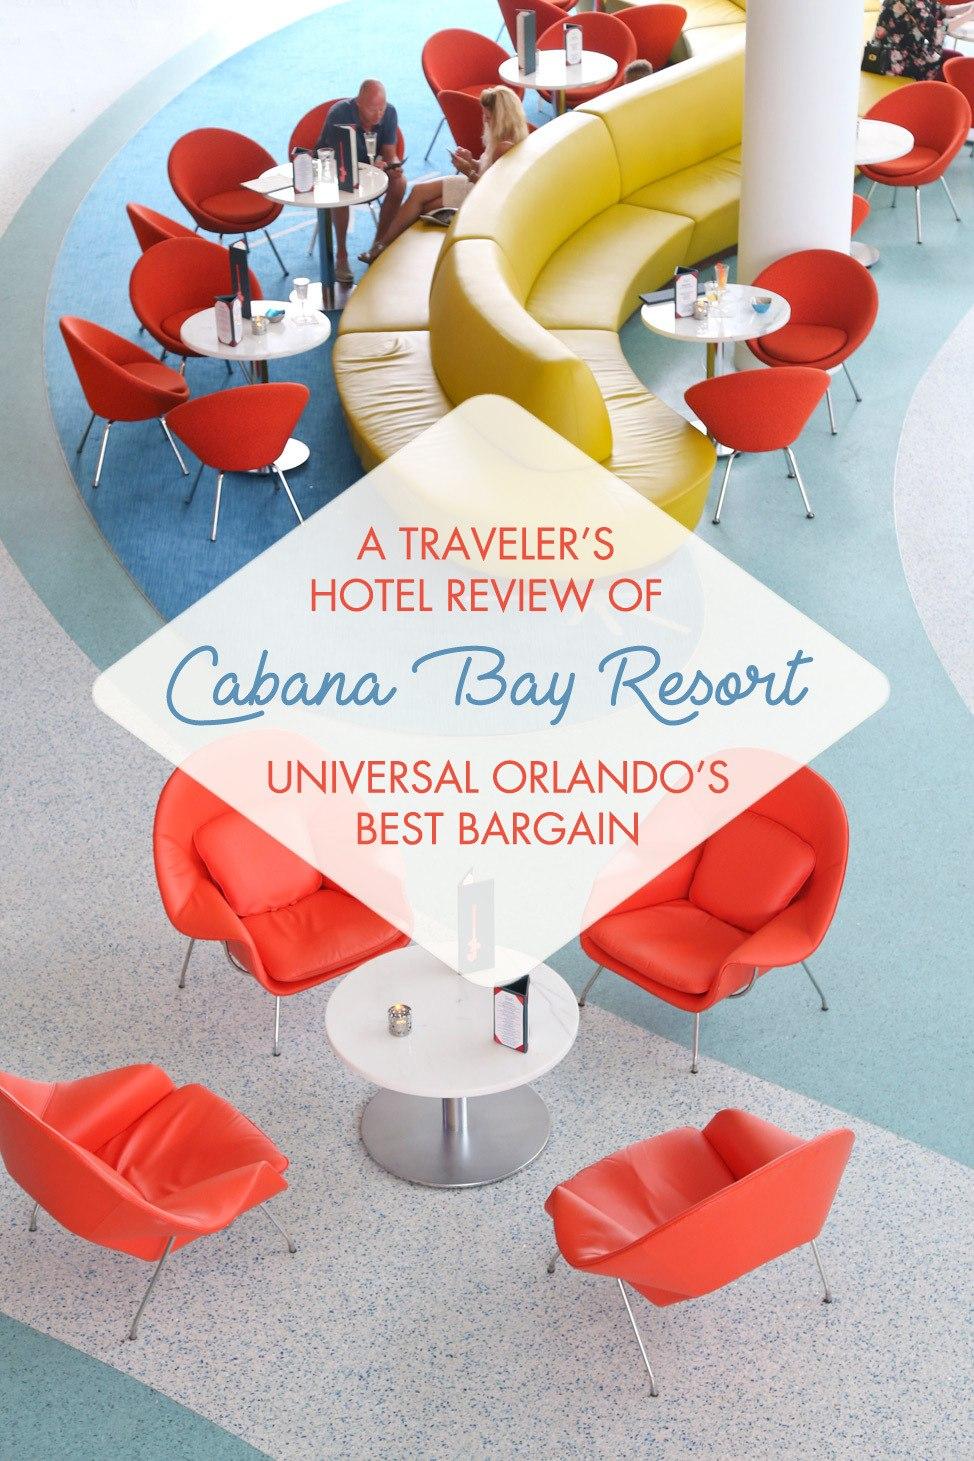 Cabana Bay Beach Resort • Universal Orlando's best value hotel